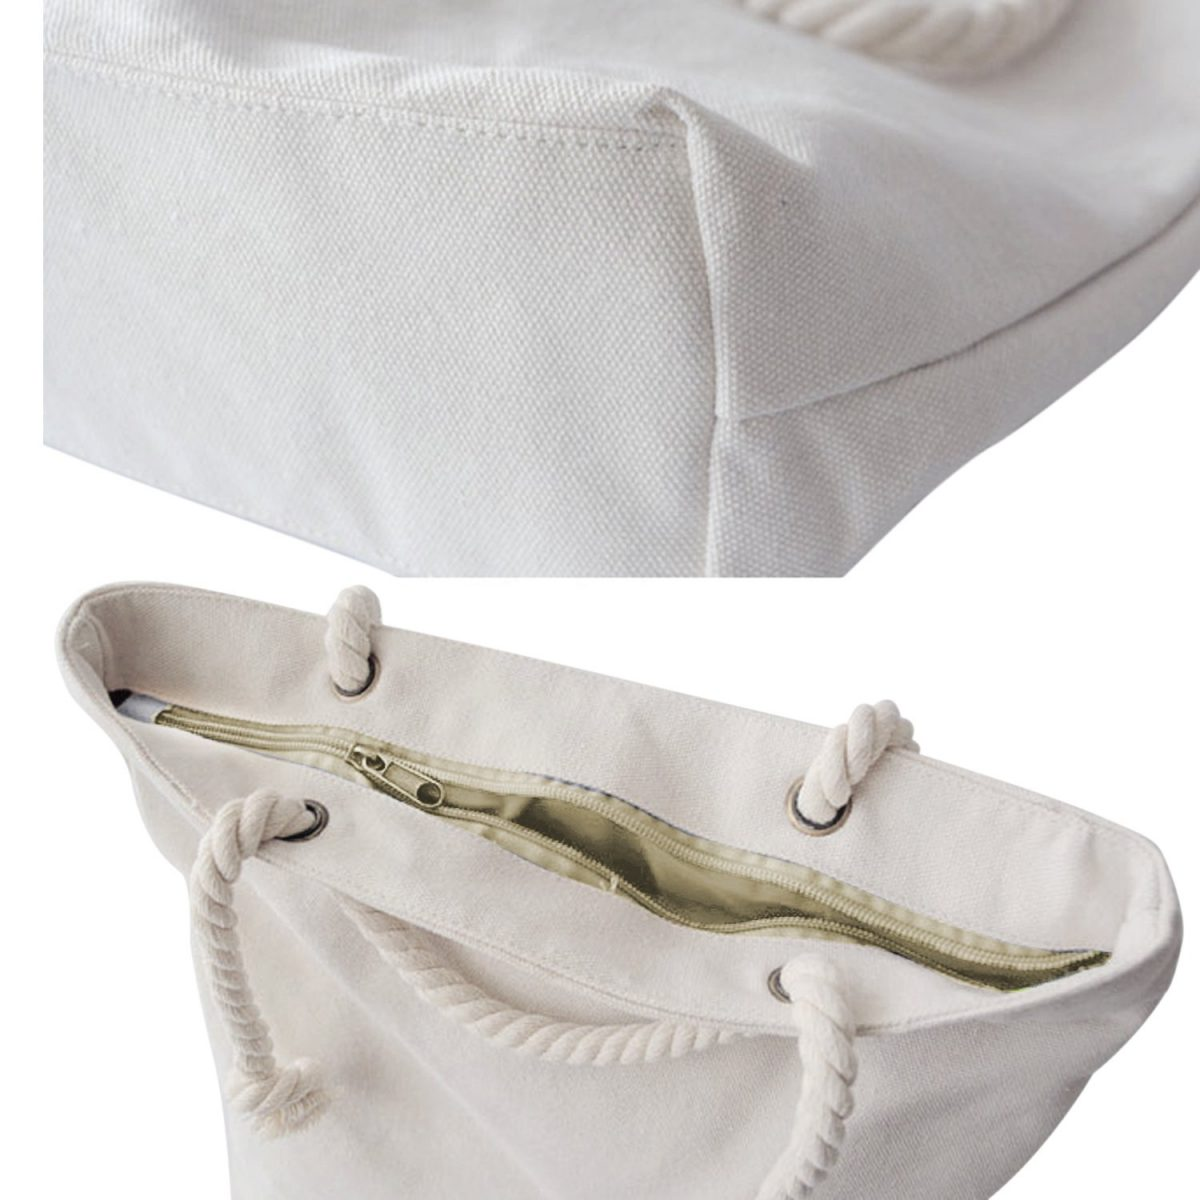 Limon Konseptli Özel Tasarım 3D Fermuarlı Modern Kumaş Çanta Realhomes